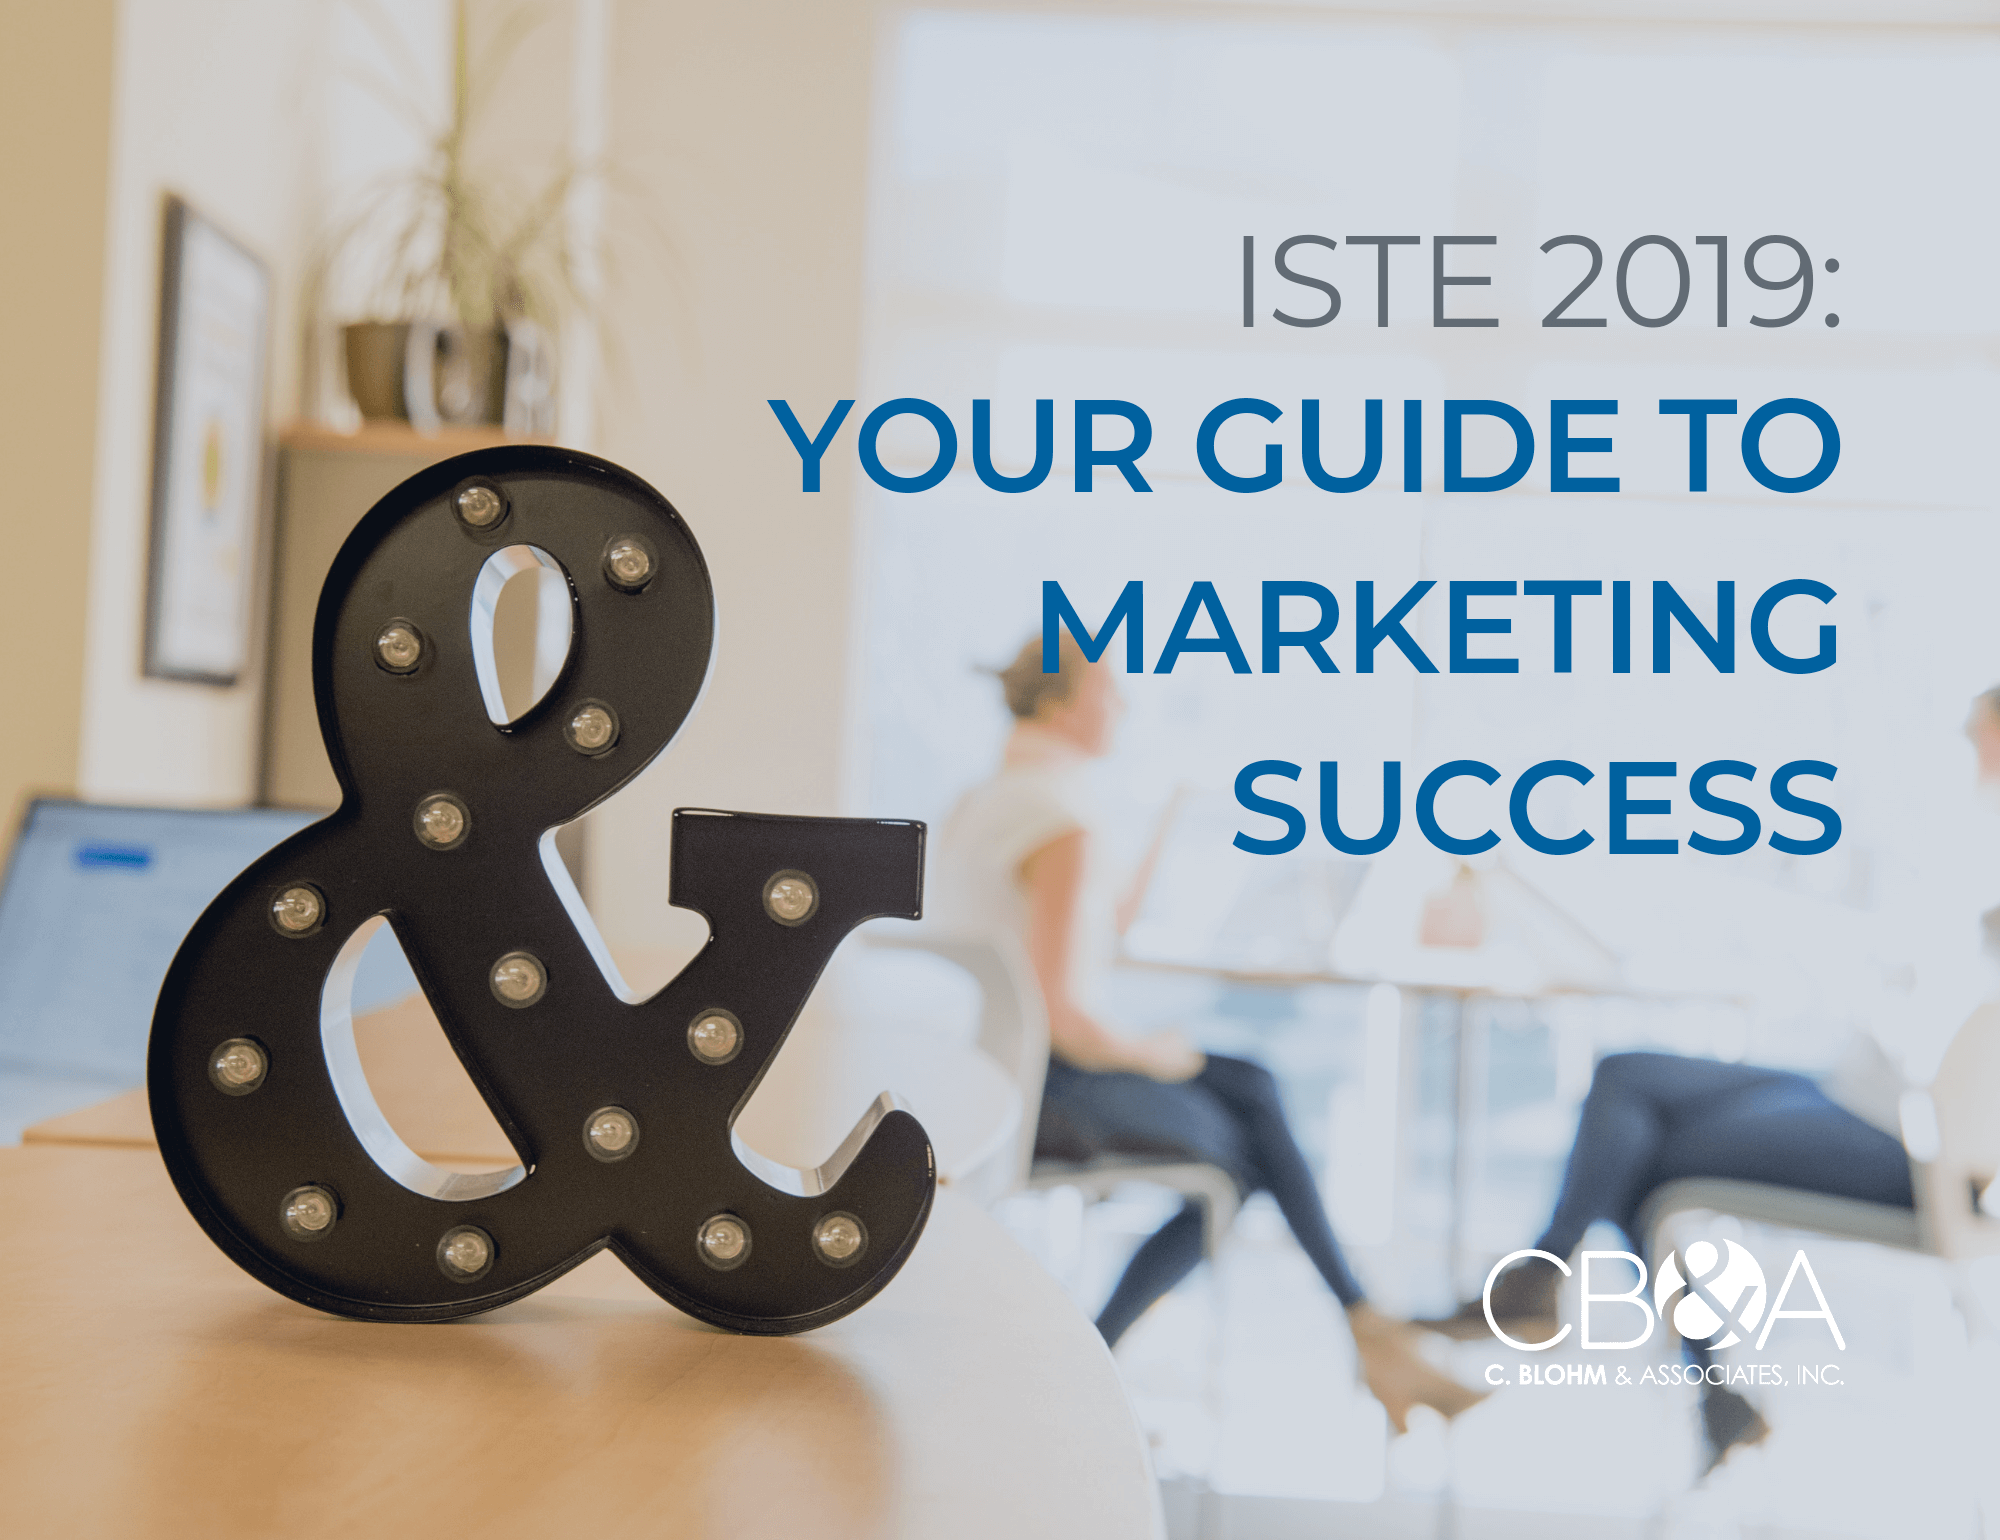 2019 ISTE Marketing eBook Cover